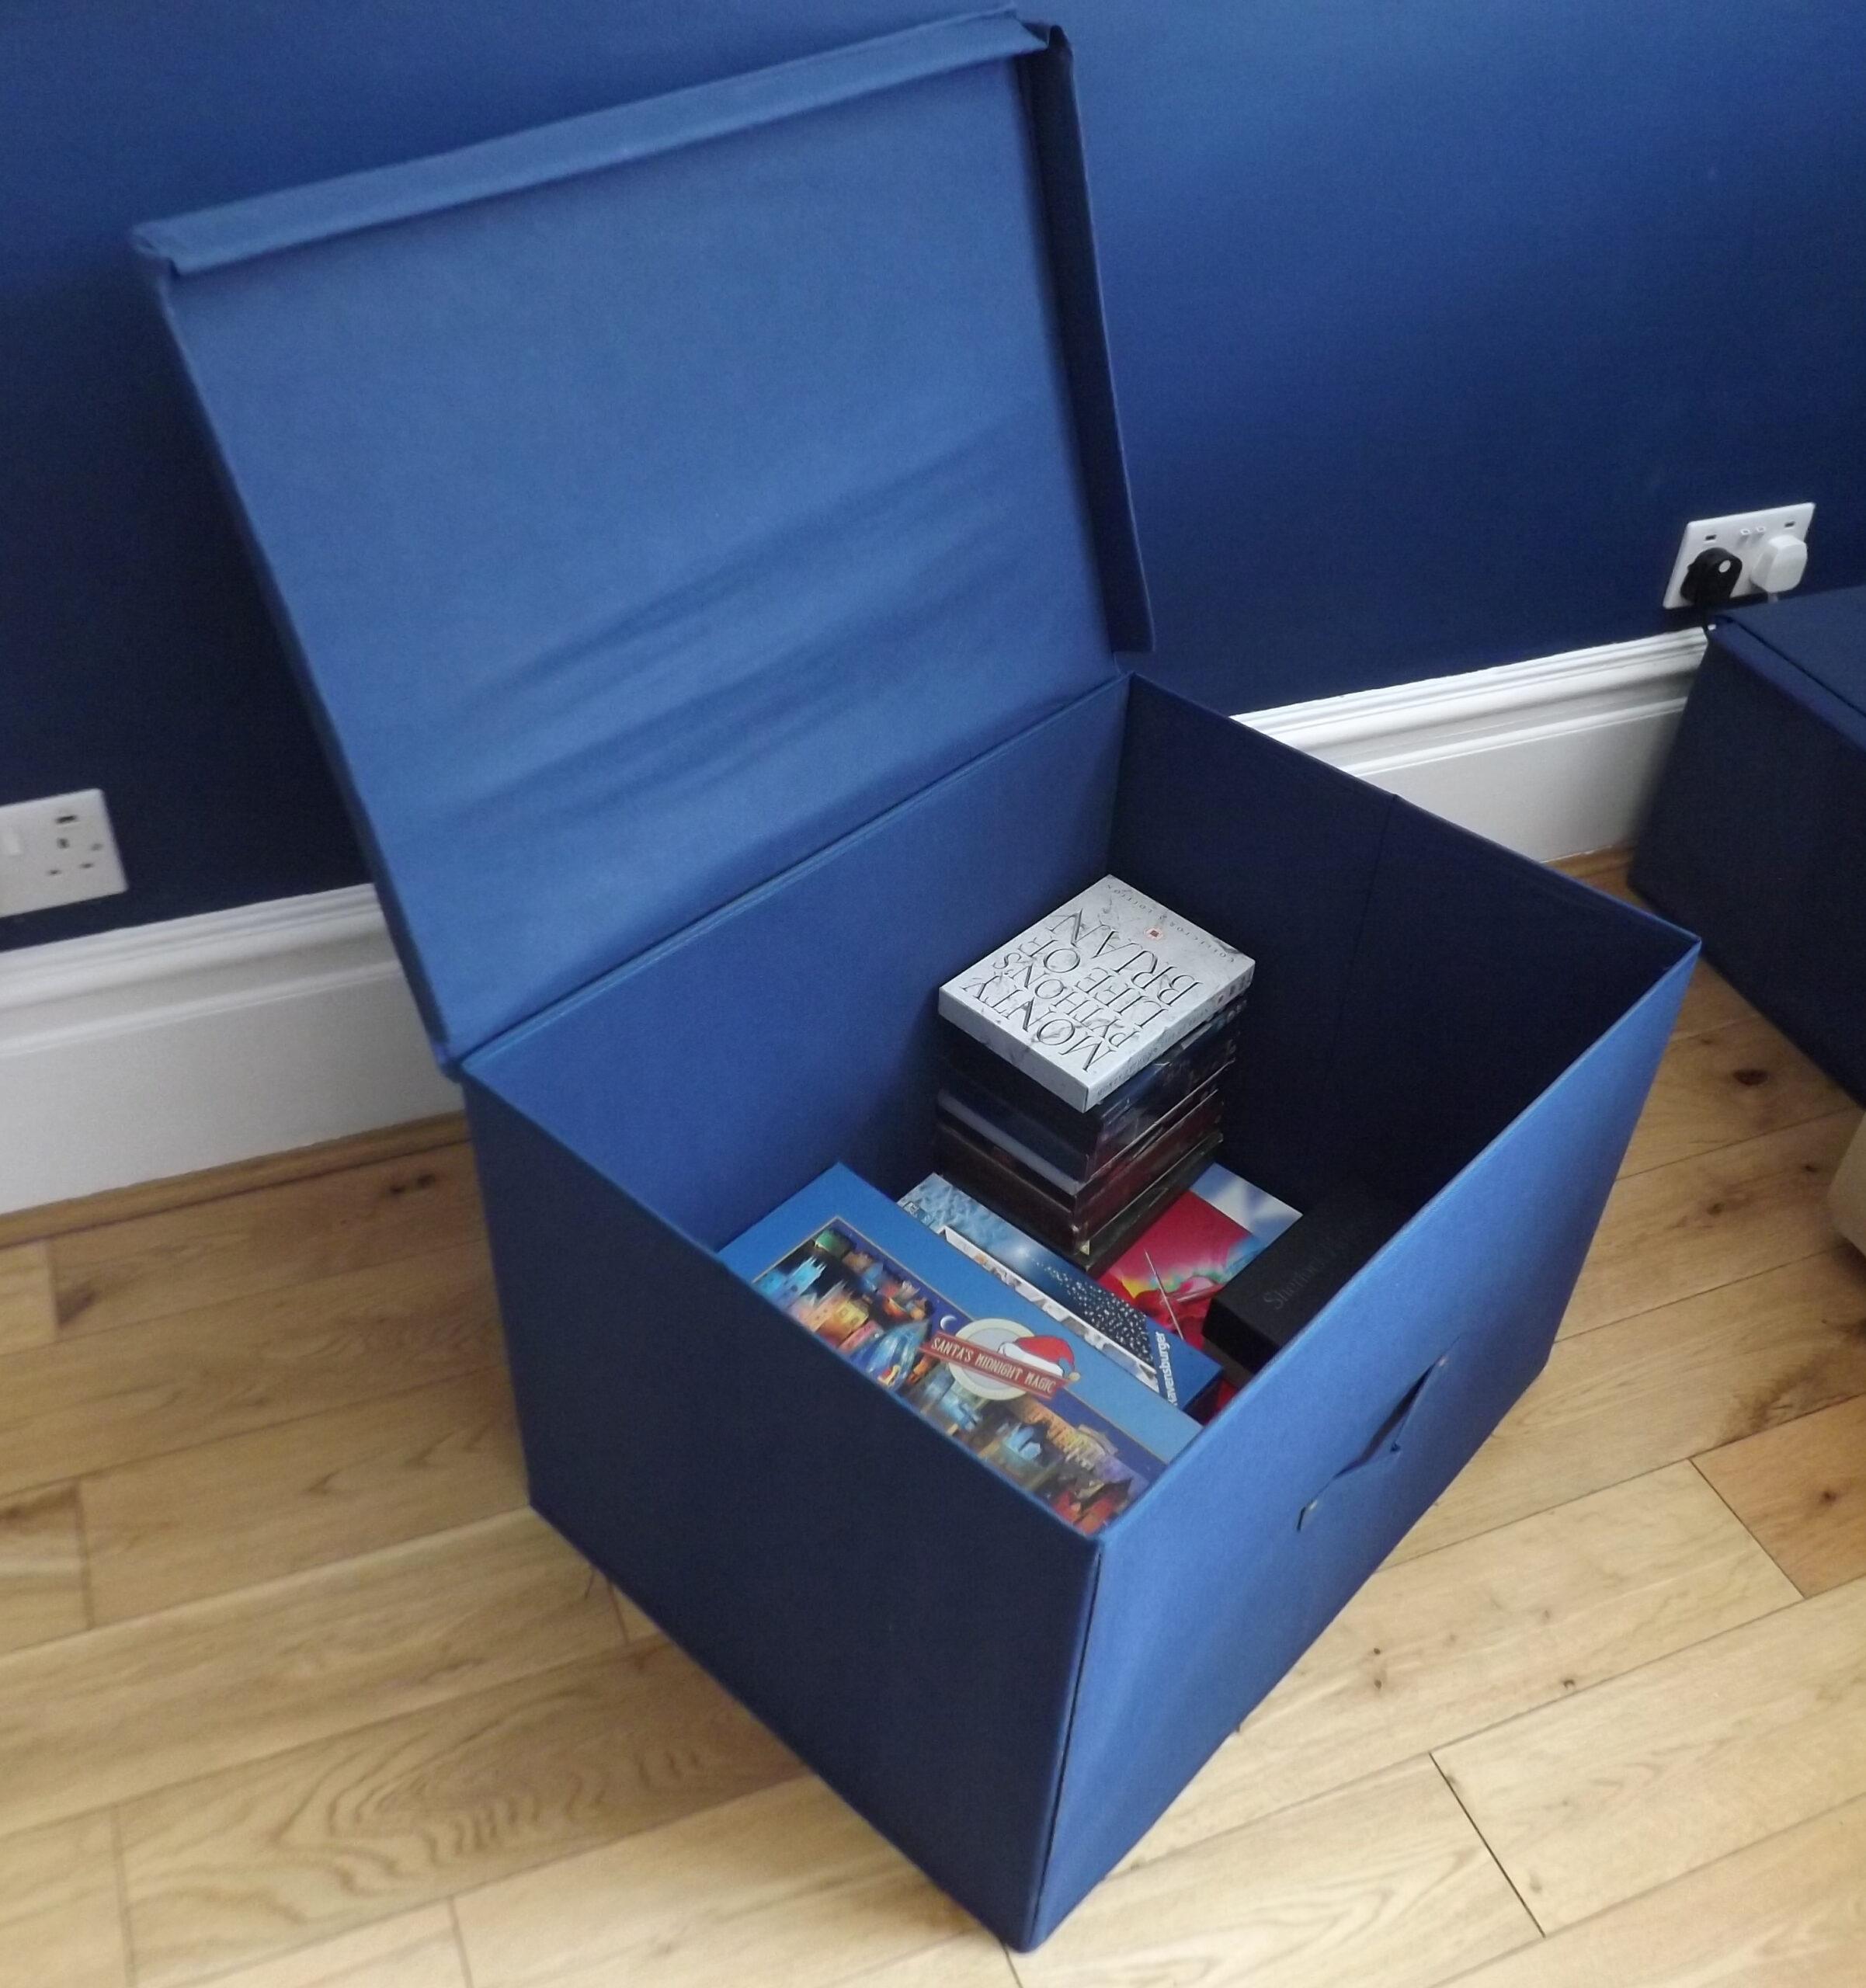 Super Jumbo Foldable Box With Lid, Heavy Duty, 100 Litre Capacity, 60x45x40cm, Blue